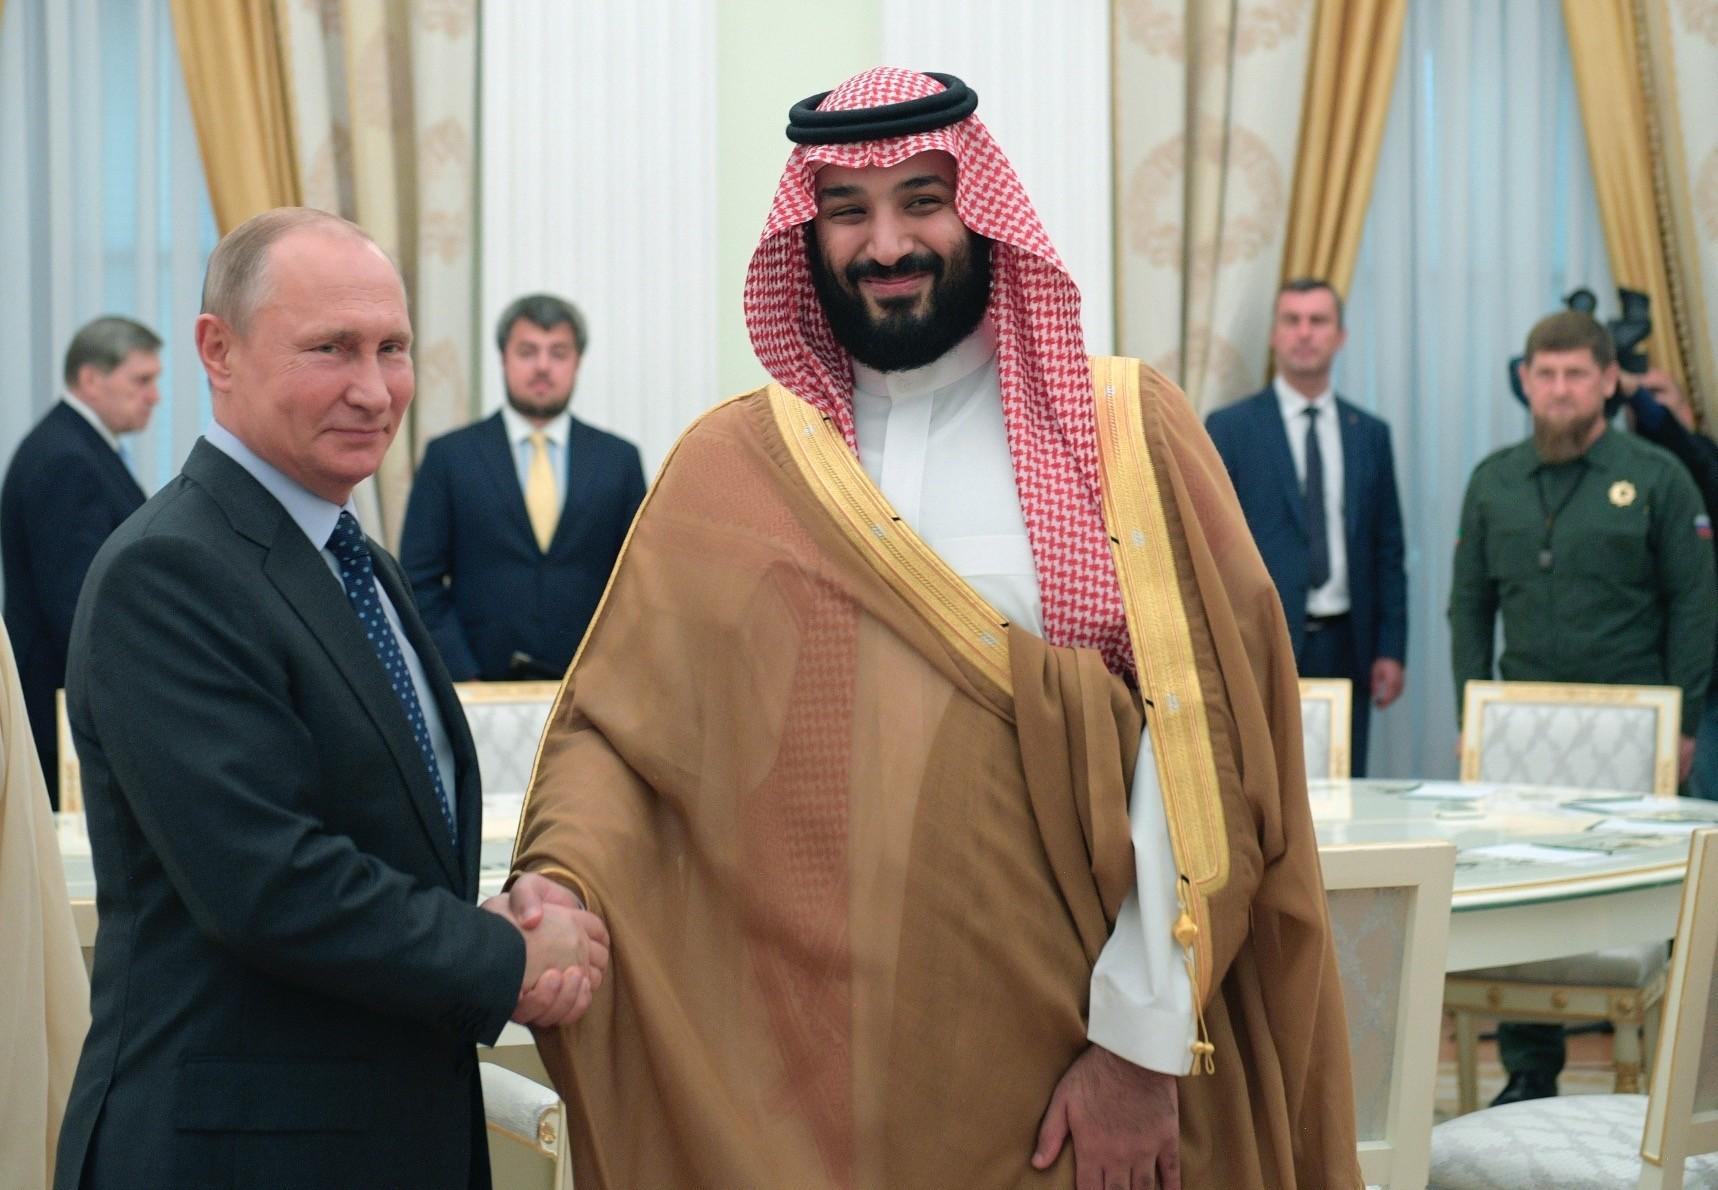 Russian President Vladimir Putin shakes hands with Saudi Arabia Crown Prince Mohammed bin Salman during their meeting in Moscow, June 14.